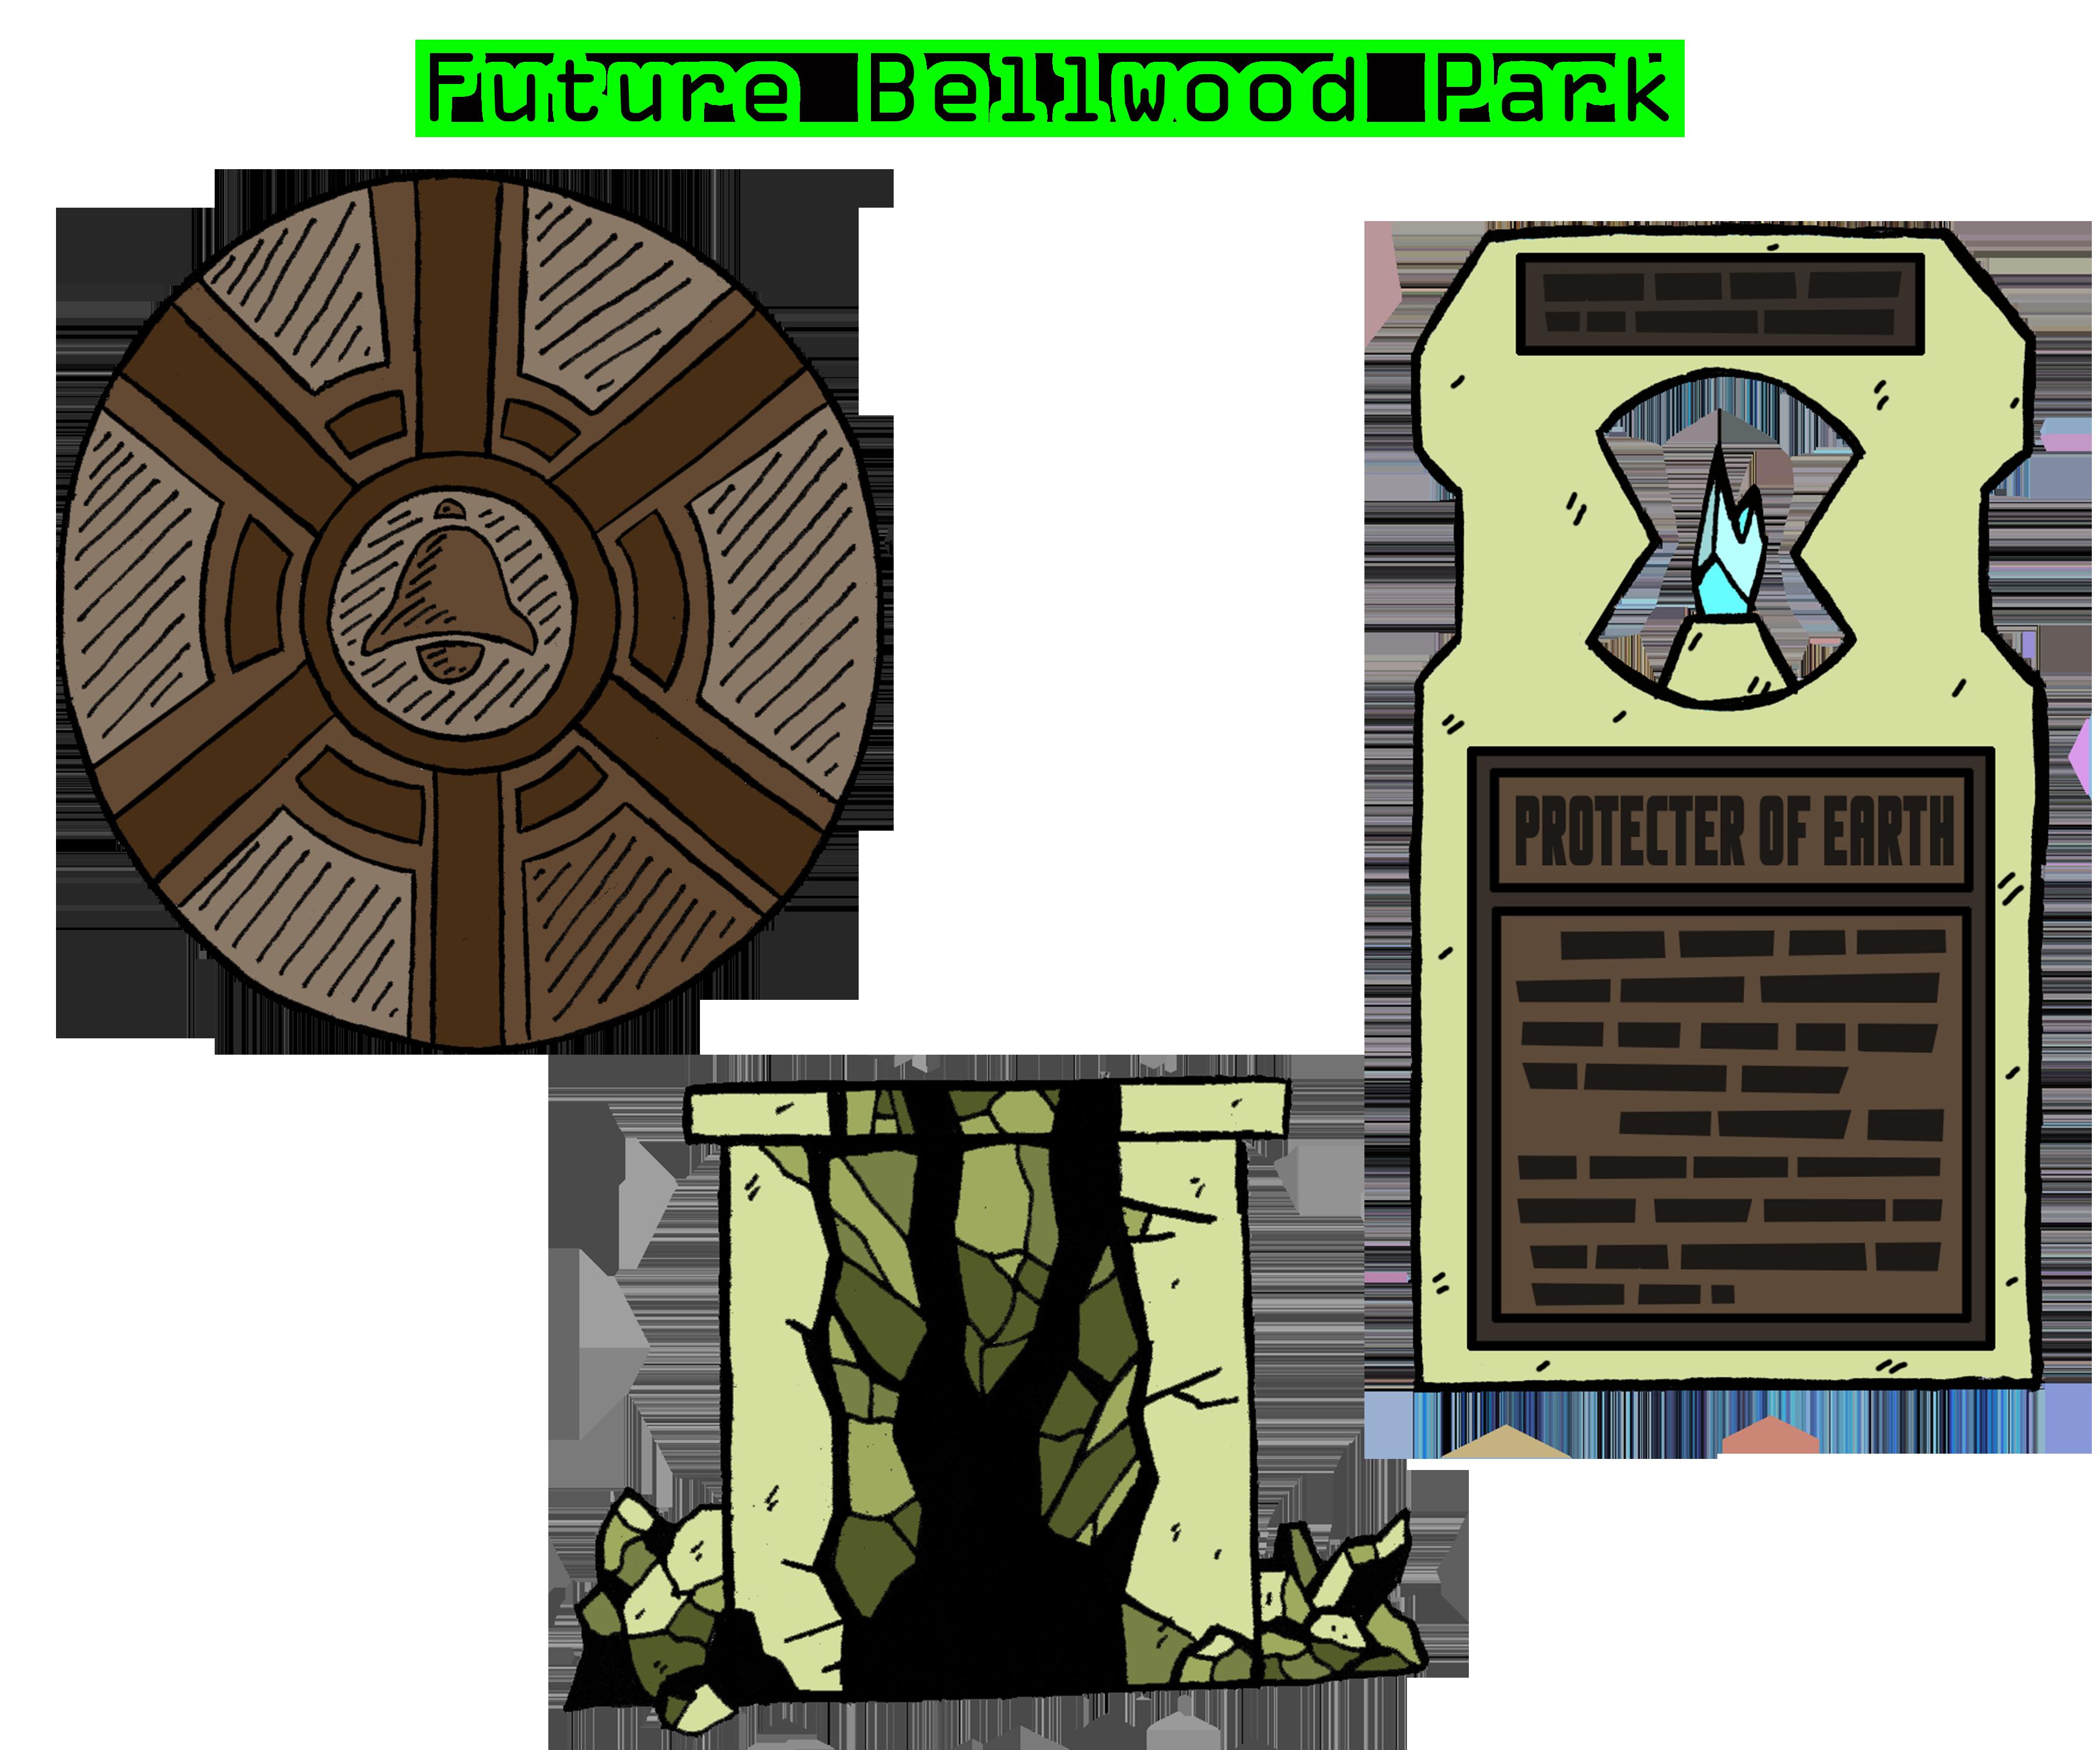 Future Bellwood Park